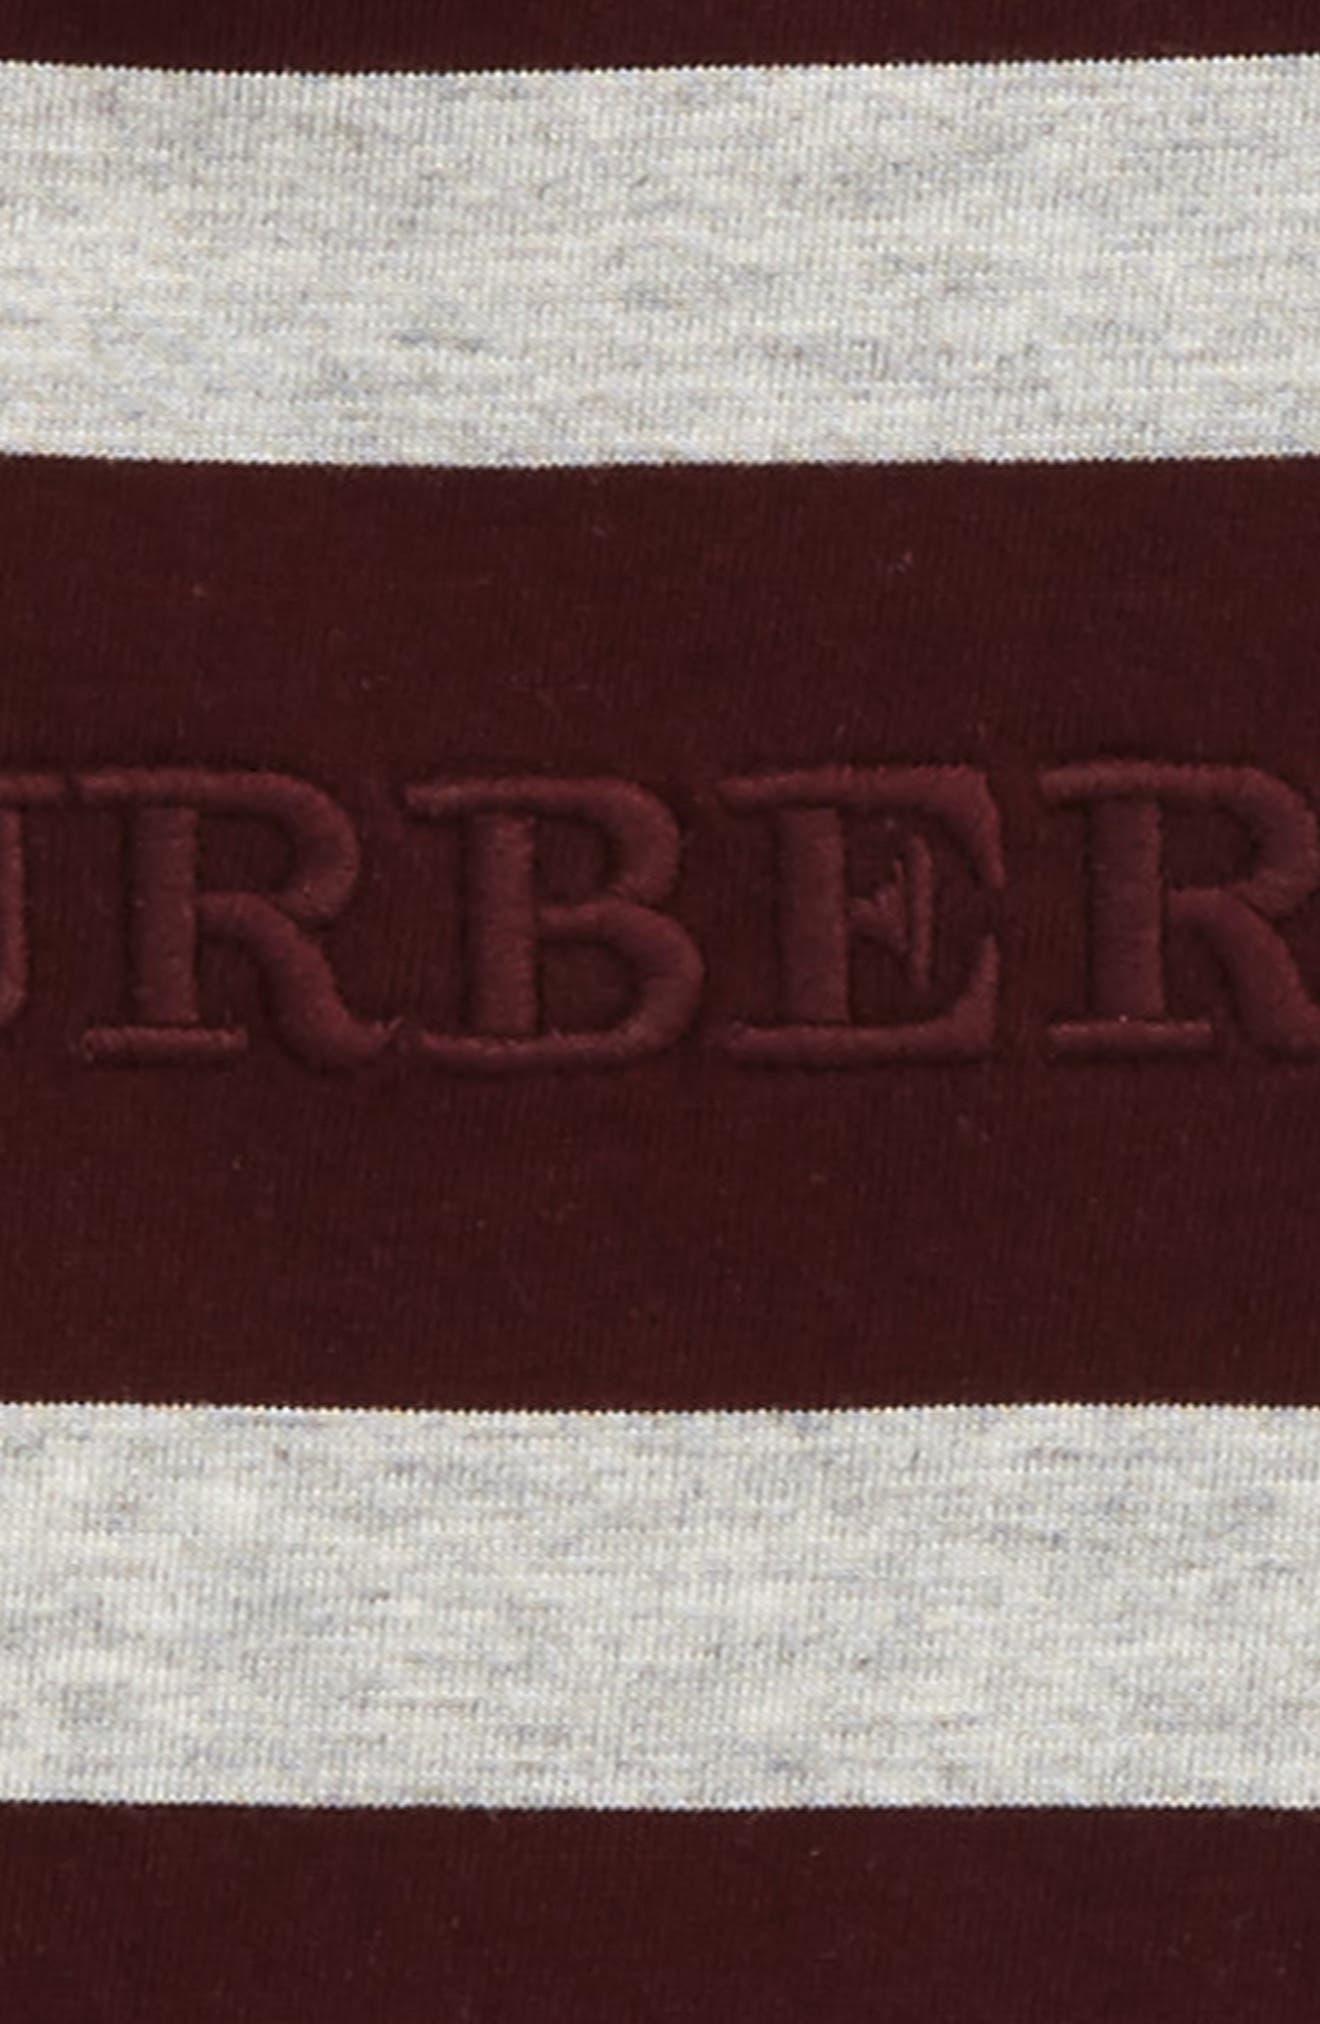 Mathew Stripe T-Shirt,                             Alternate thumbnail 2, color,                             Burgundy/ Grey Melange